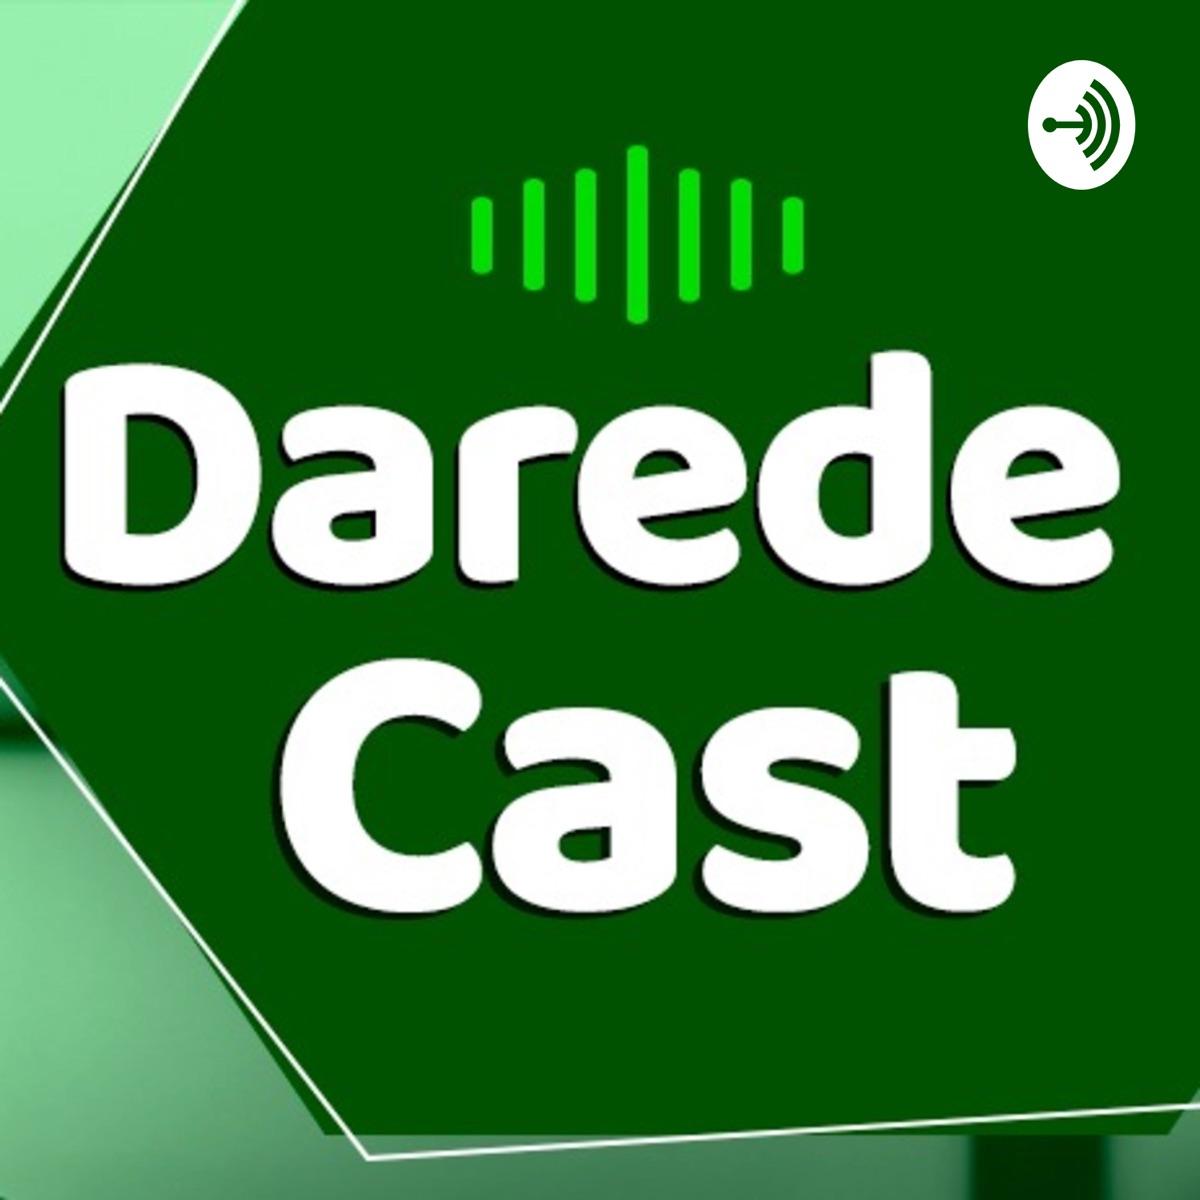 Darede Cast